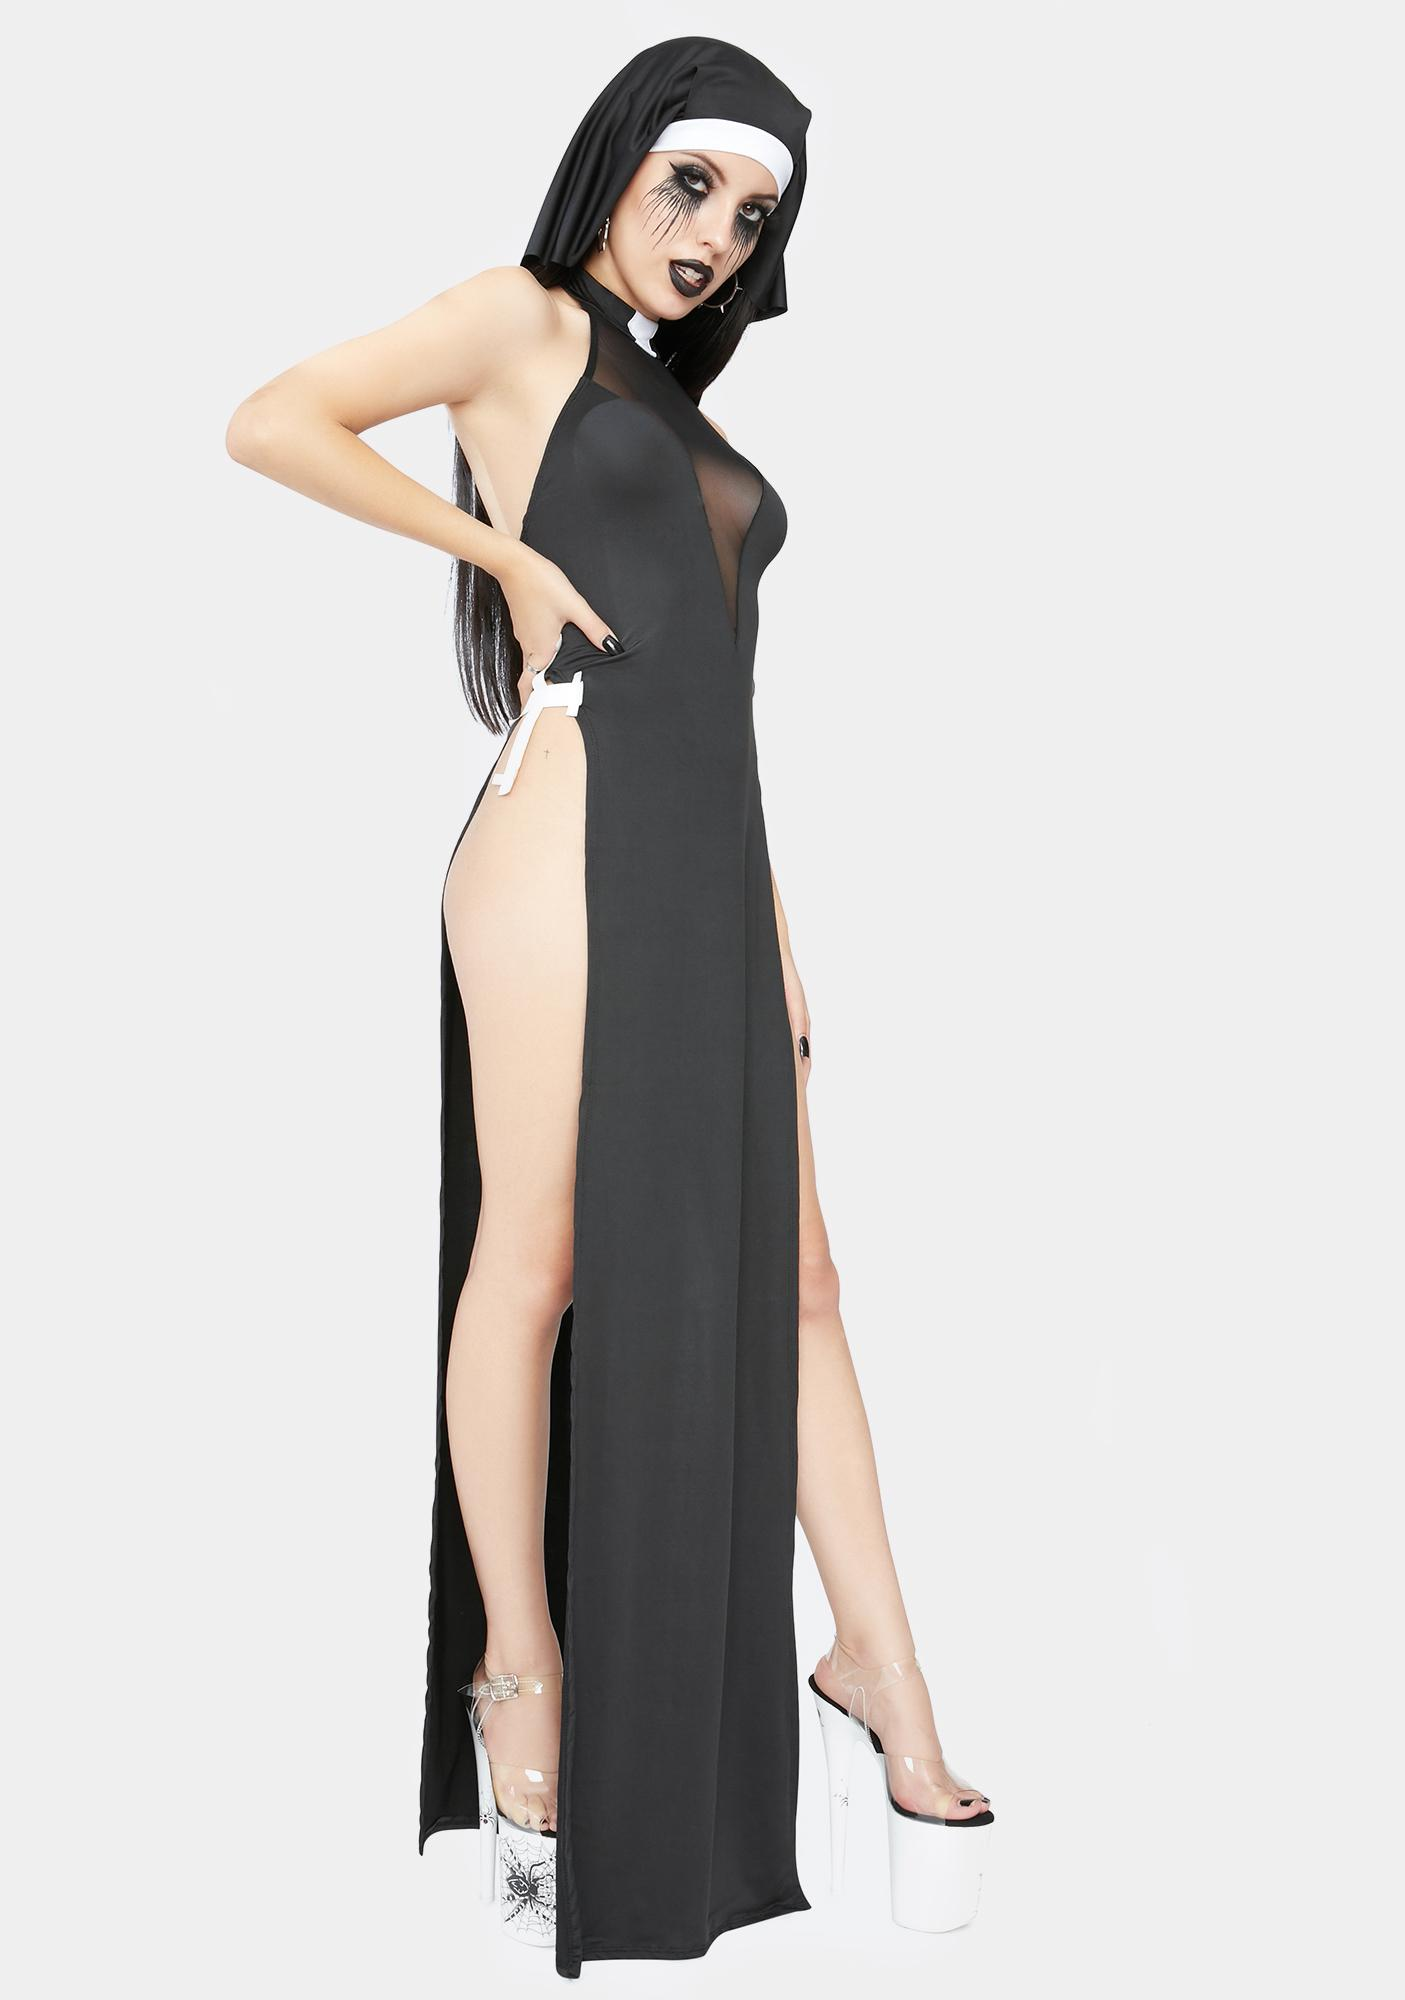 Roma Divine Mistress Nun Costume